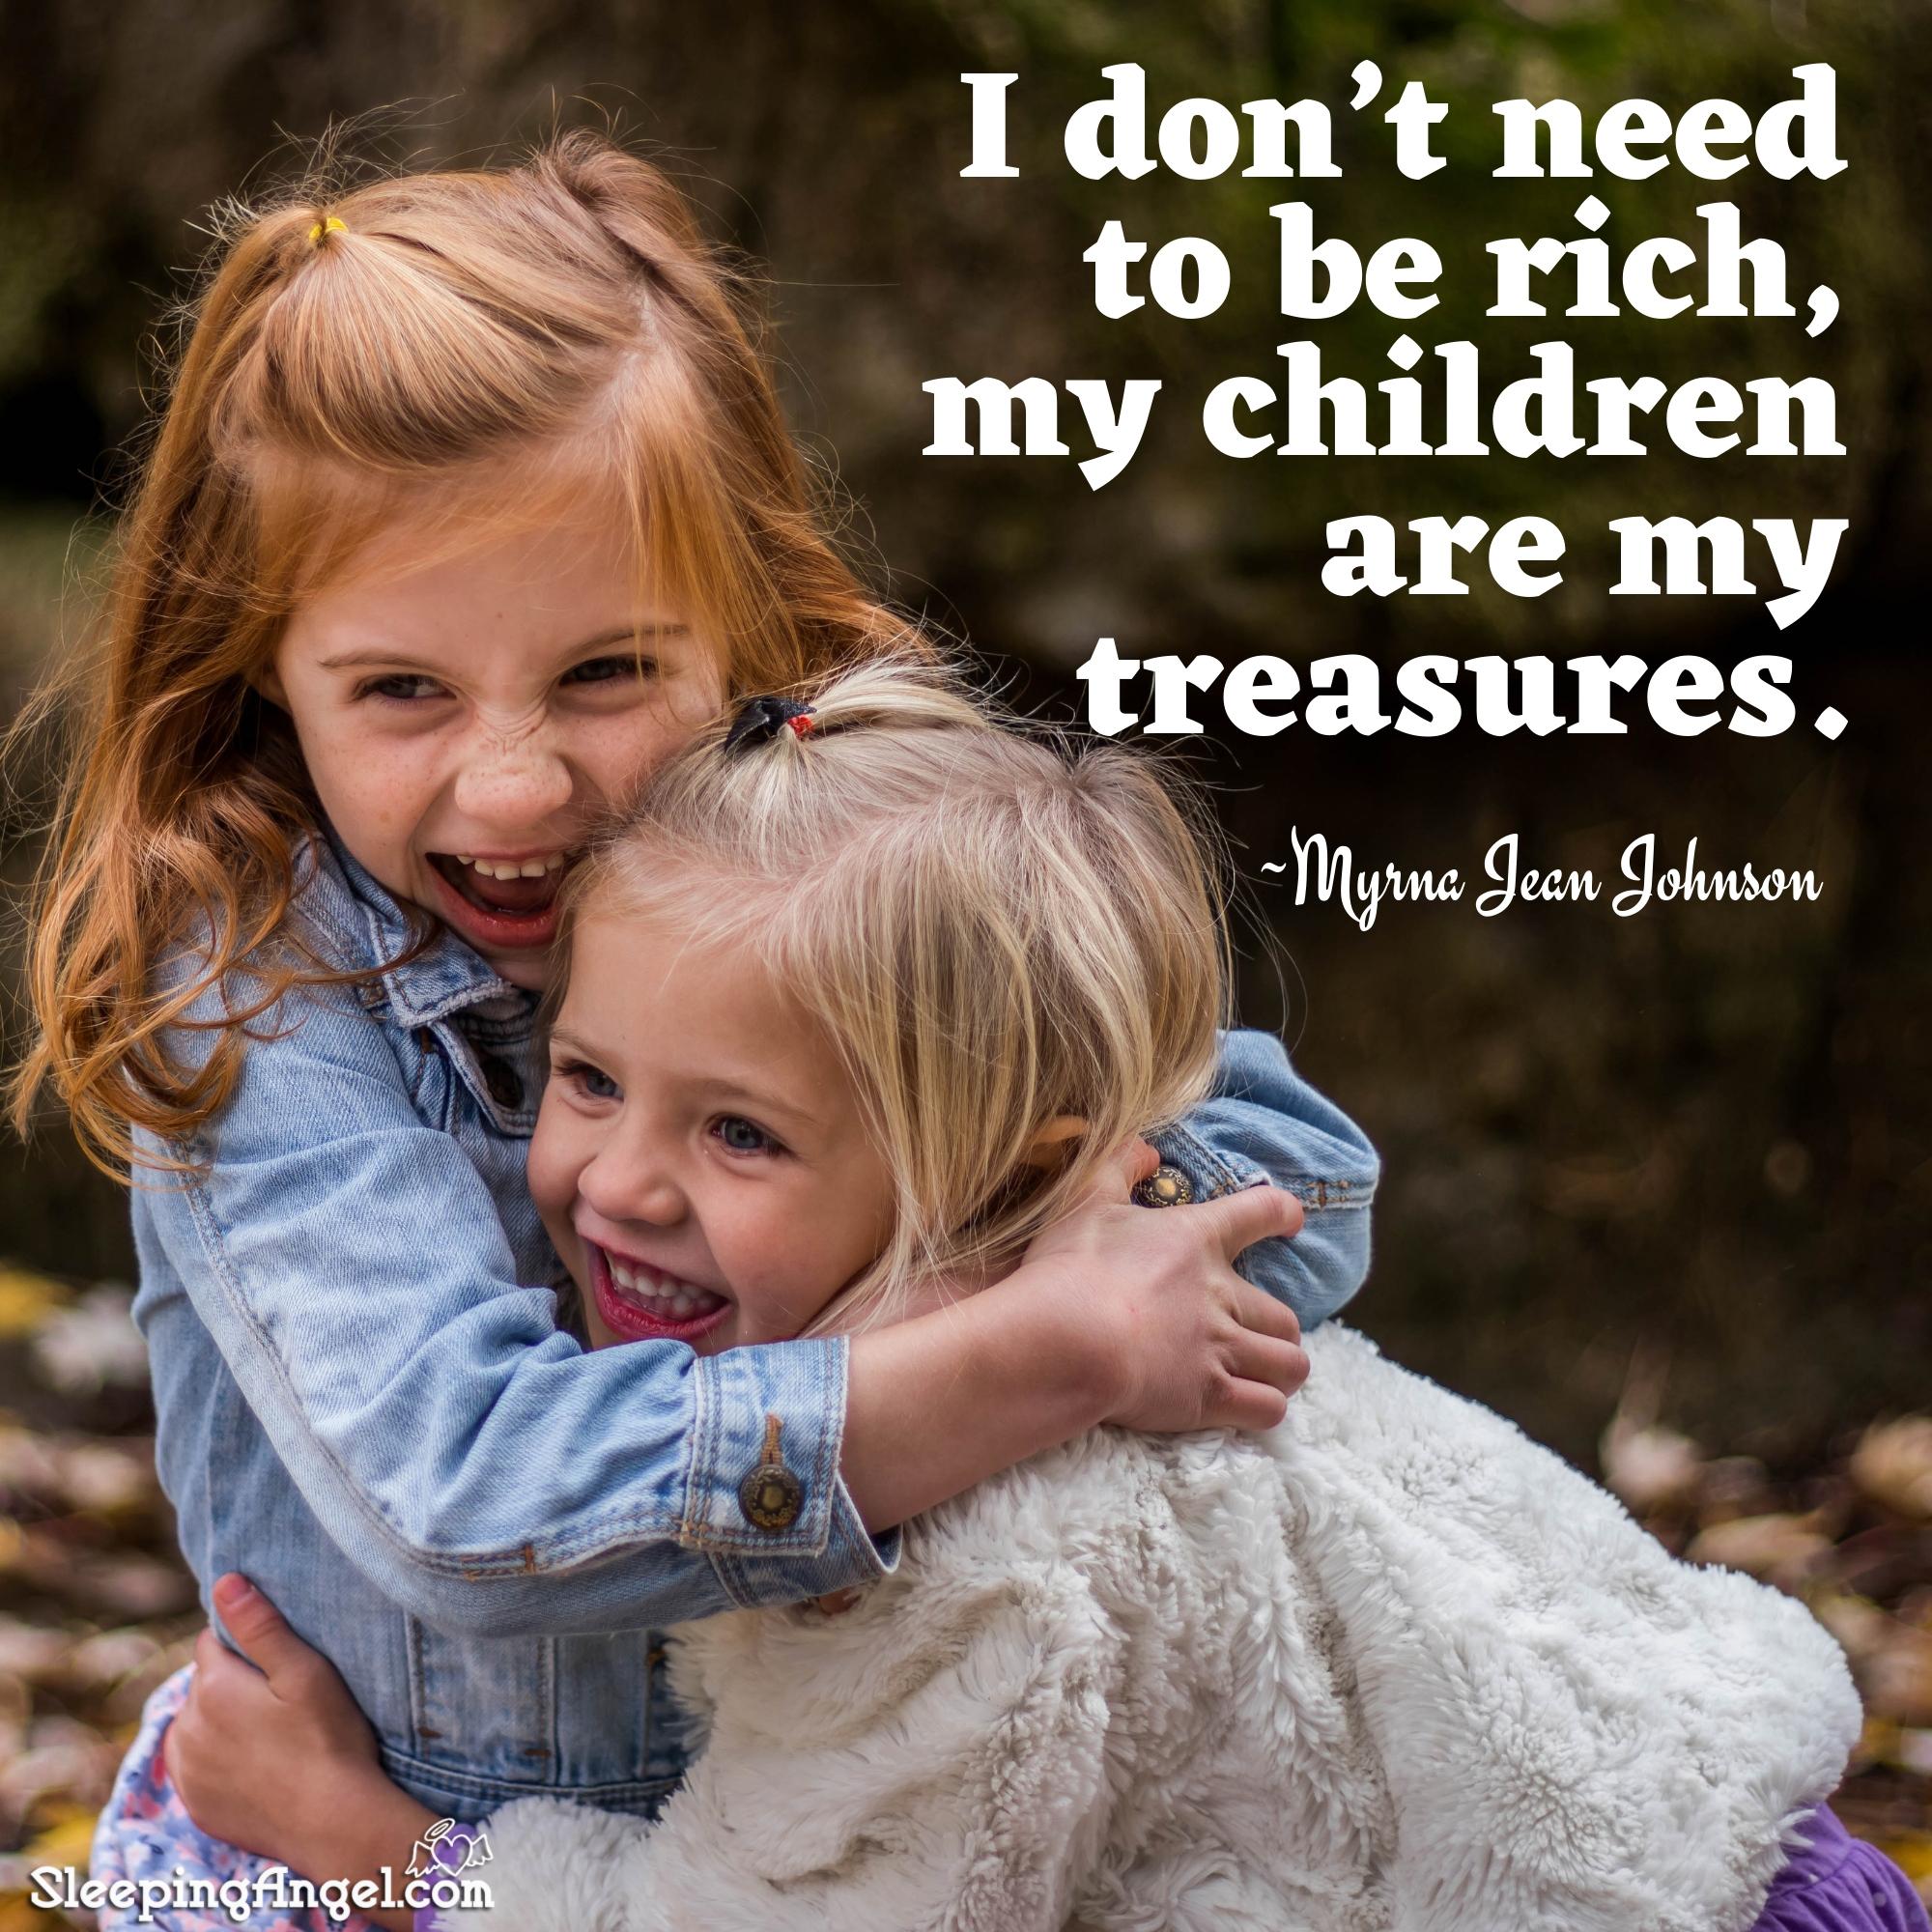 My Children Are My Treasures Quote